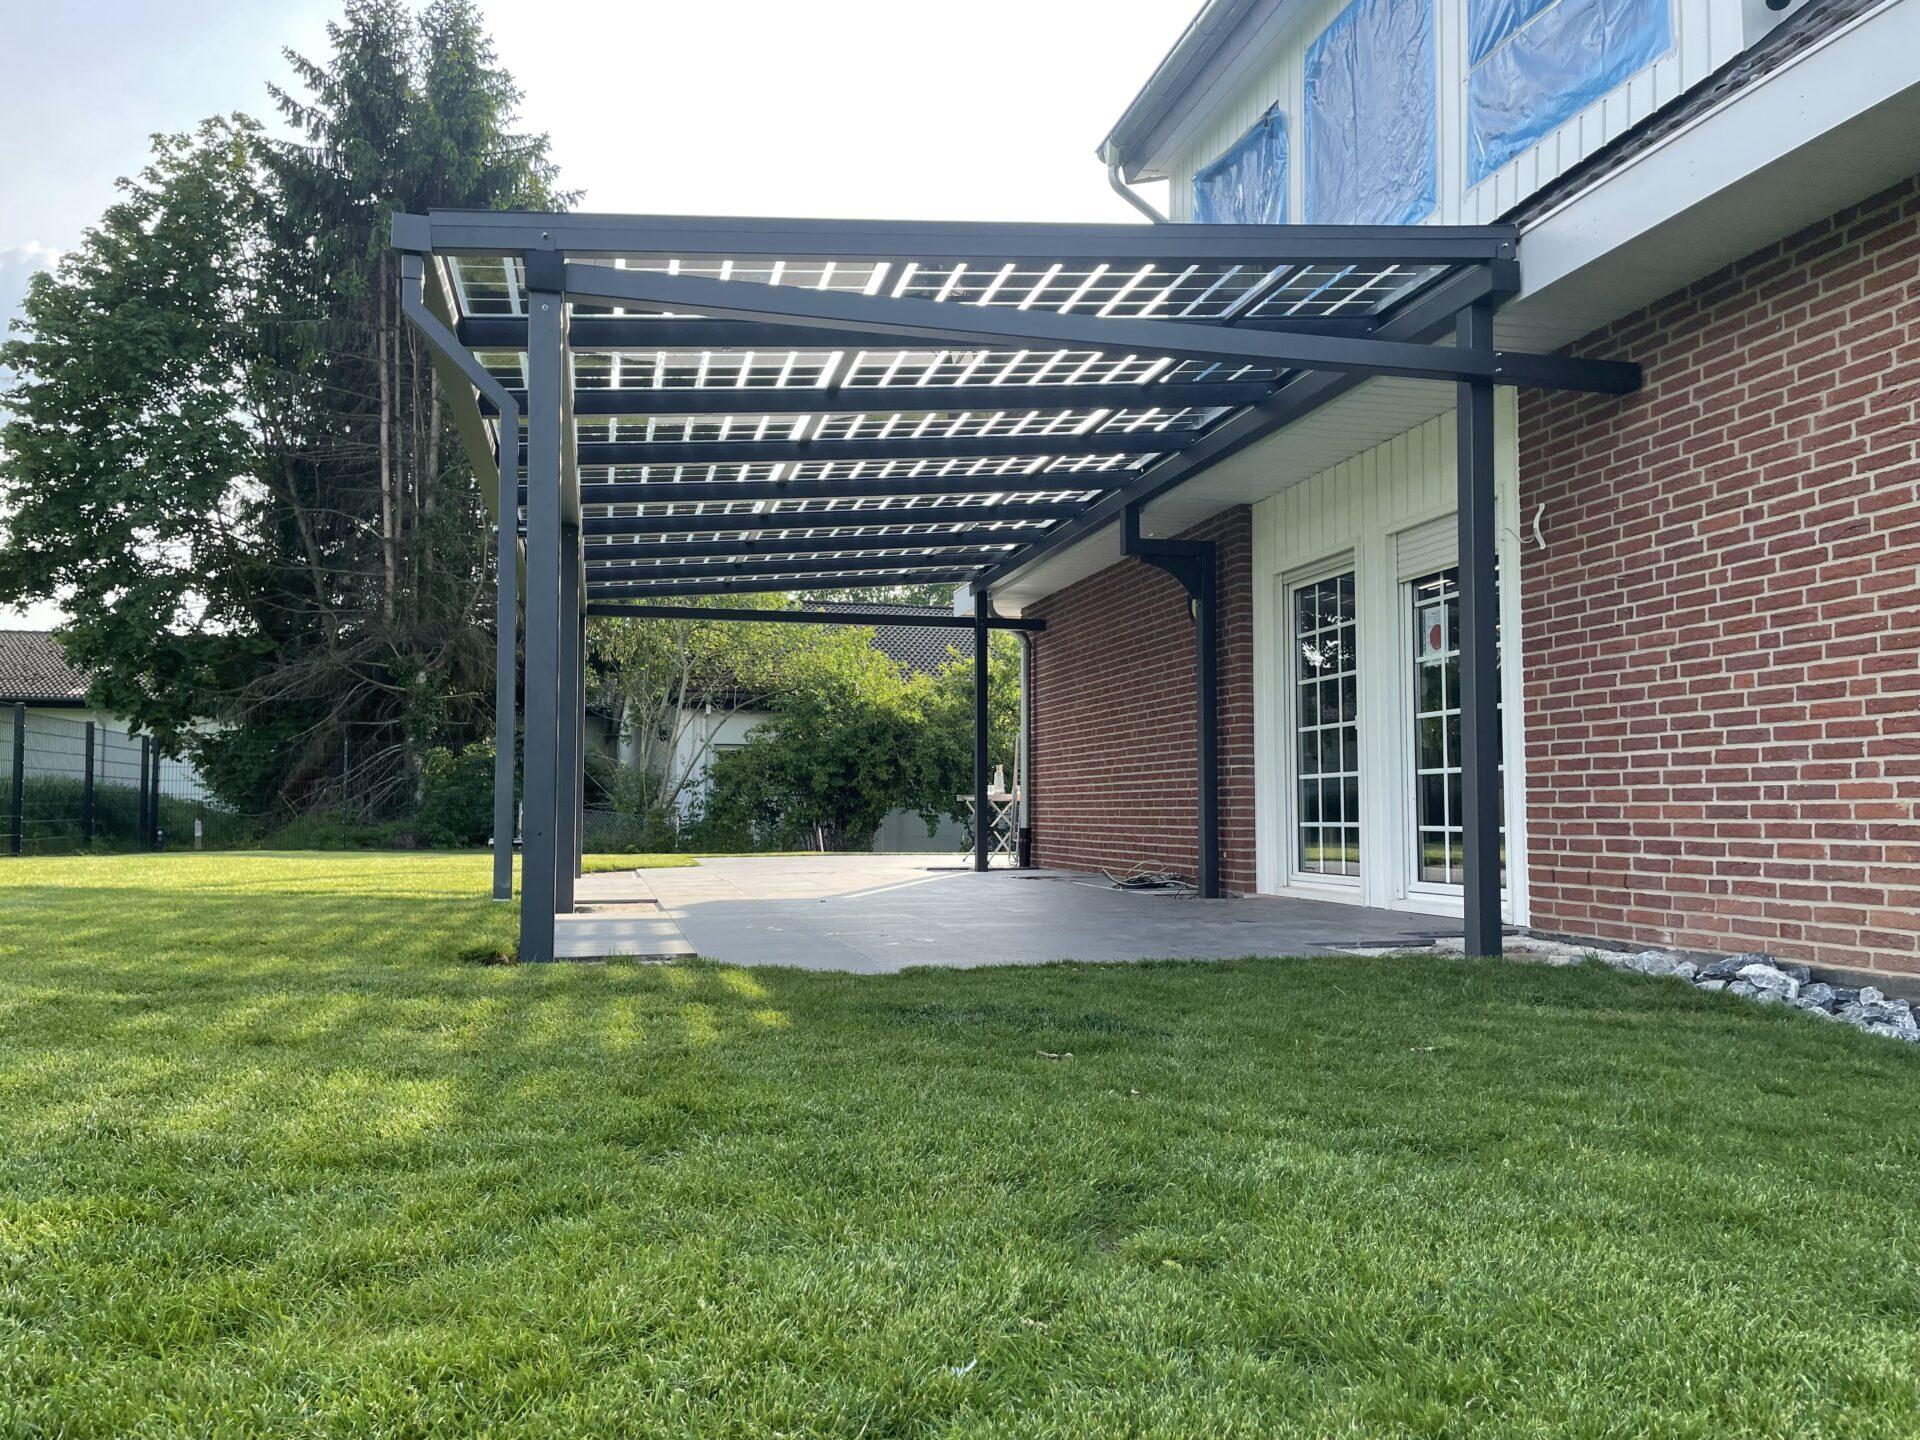 Terrassenüberdachung mit PV